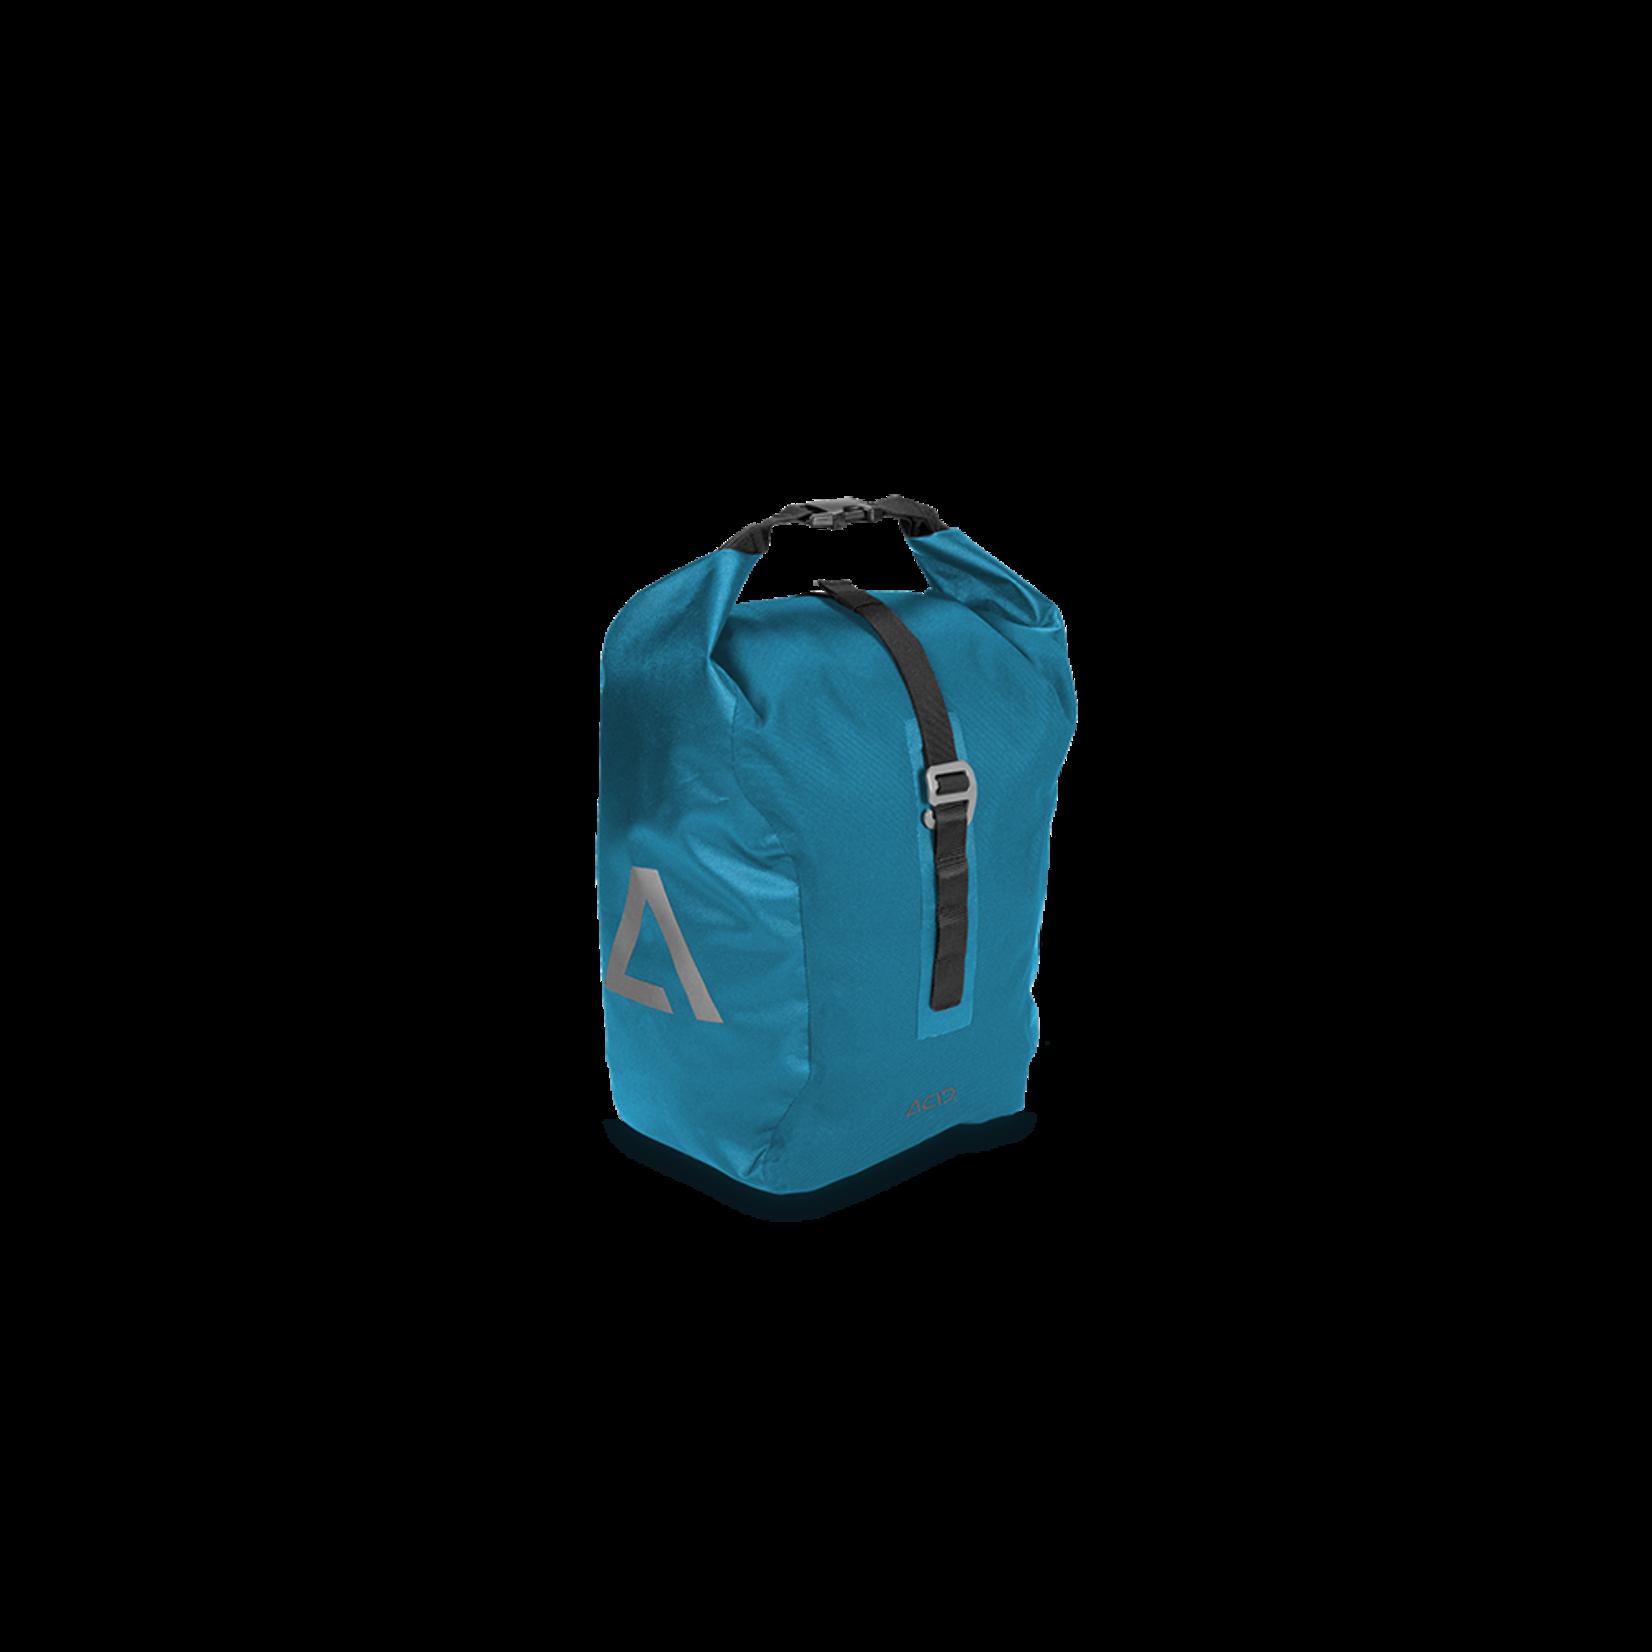 ACID ACID TRAVLR 15 - blue